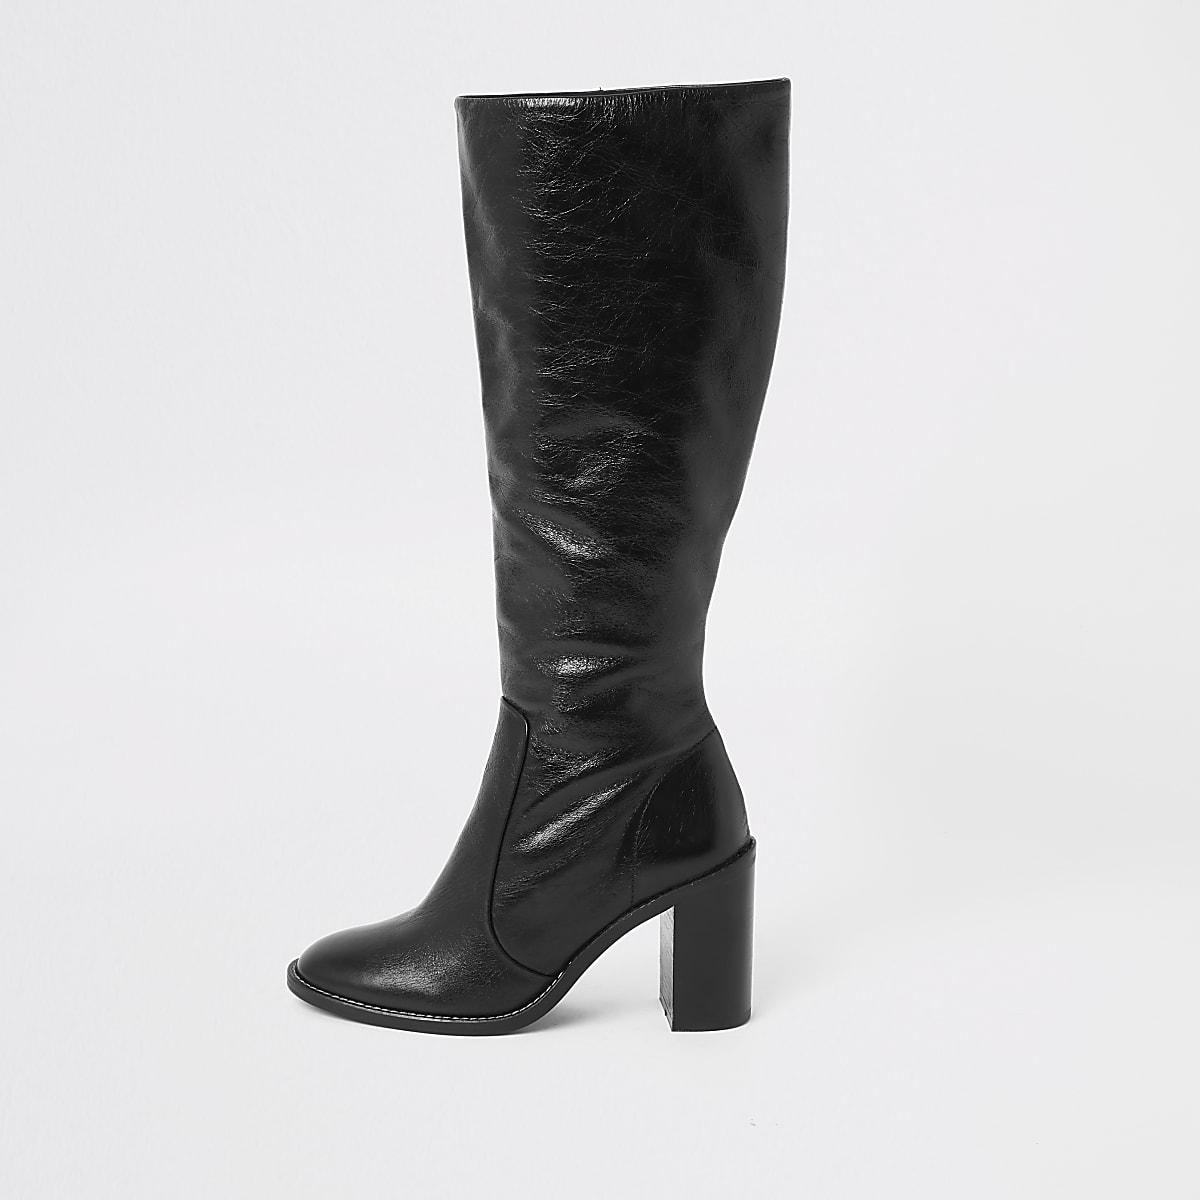 Black leather block heel knee high boots